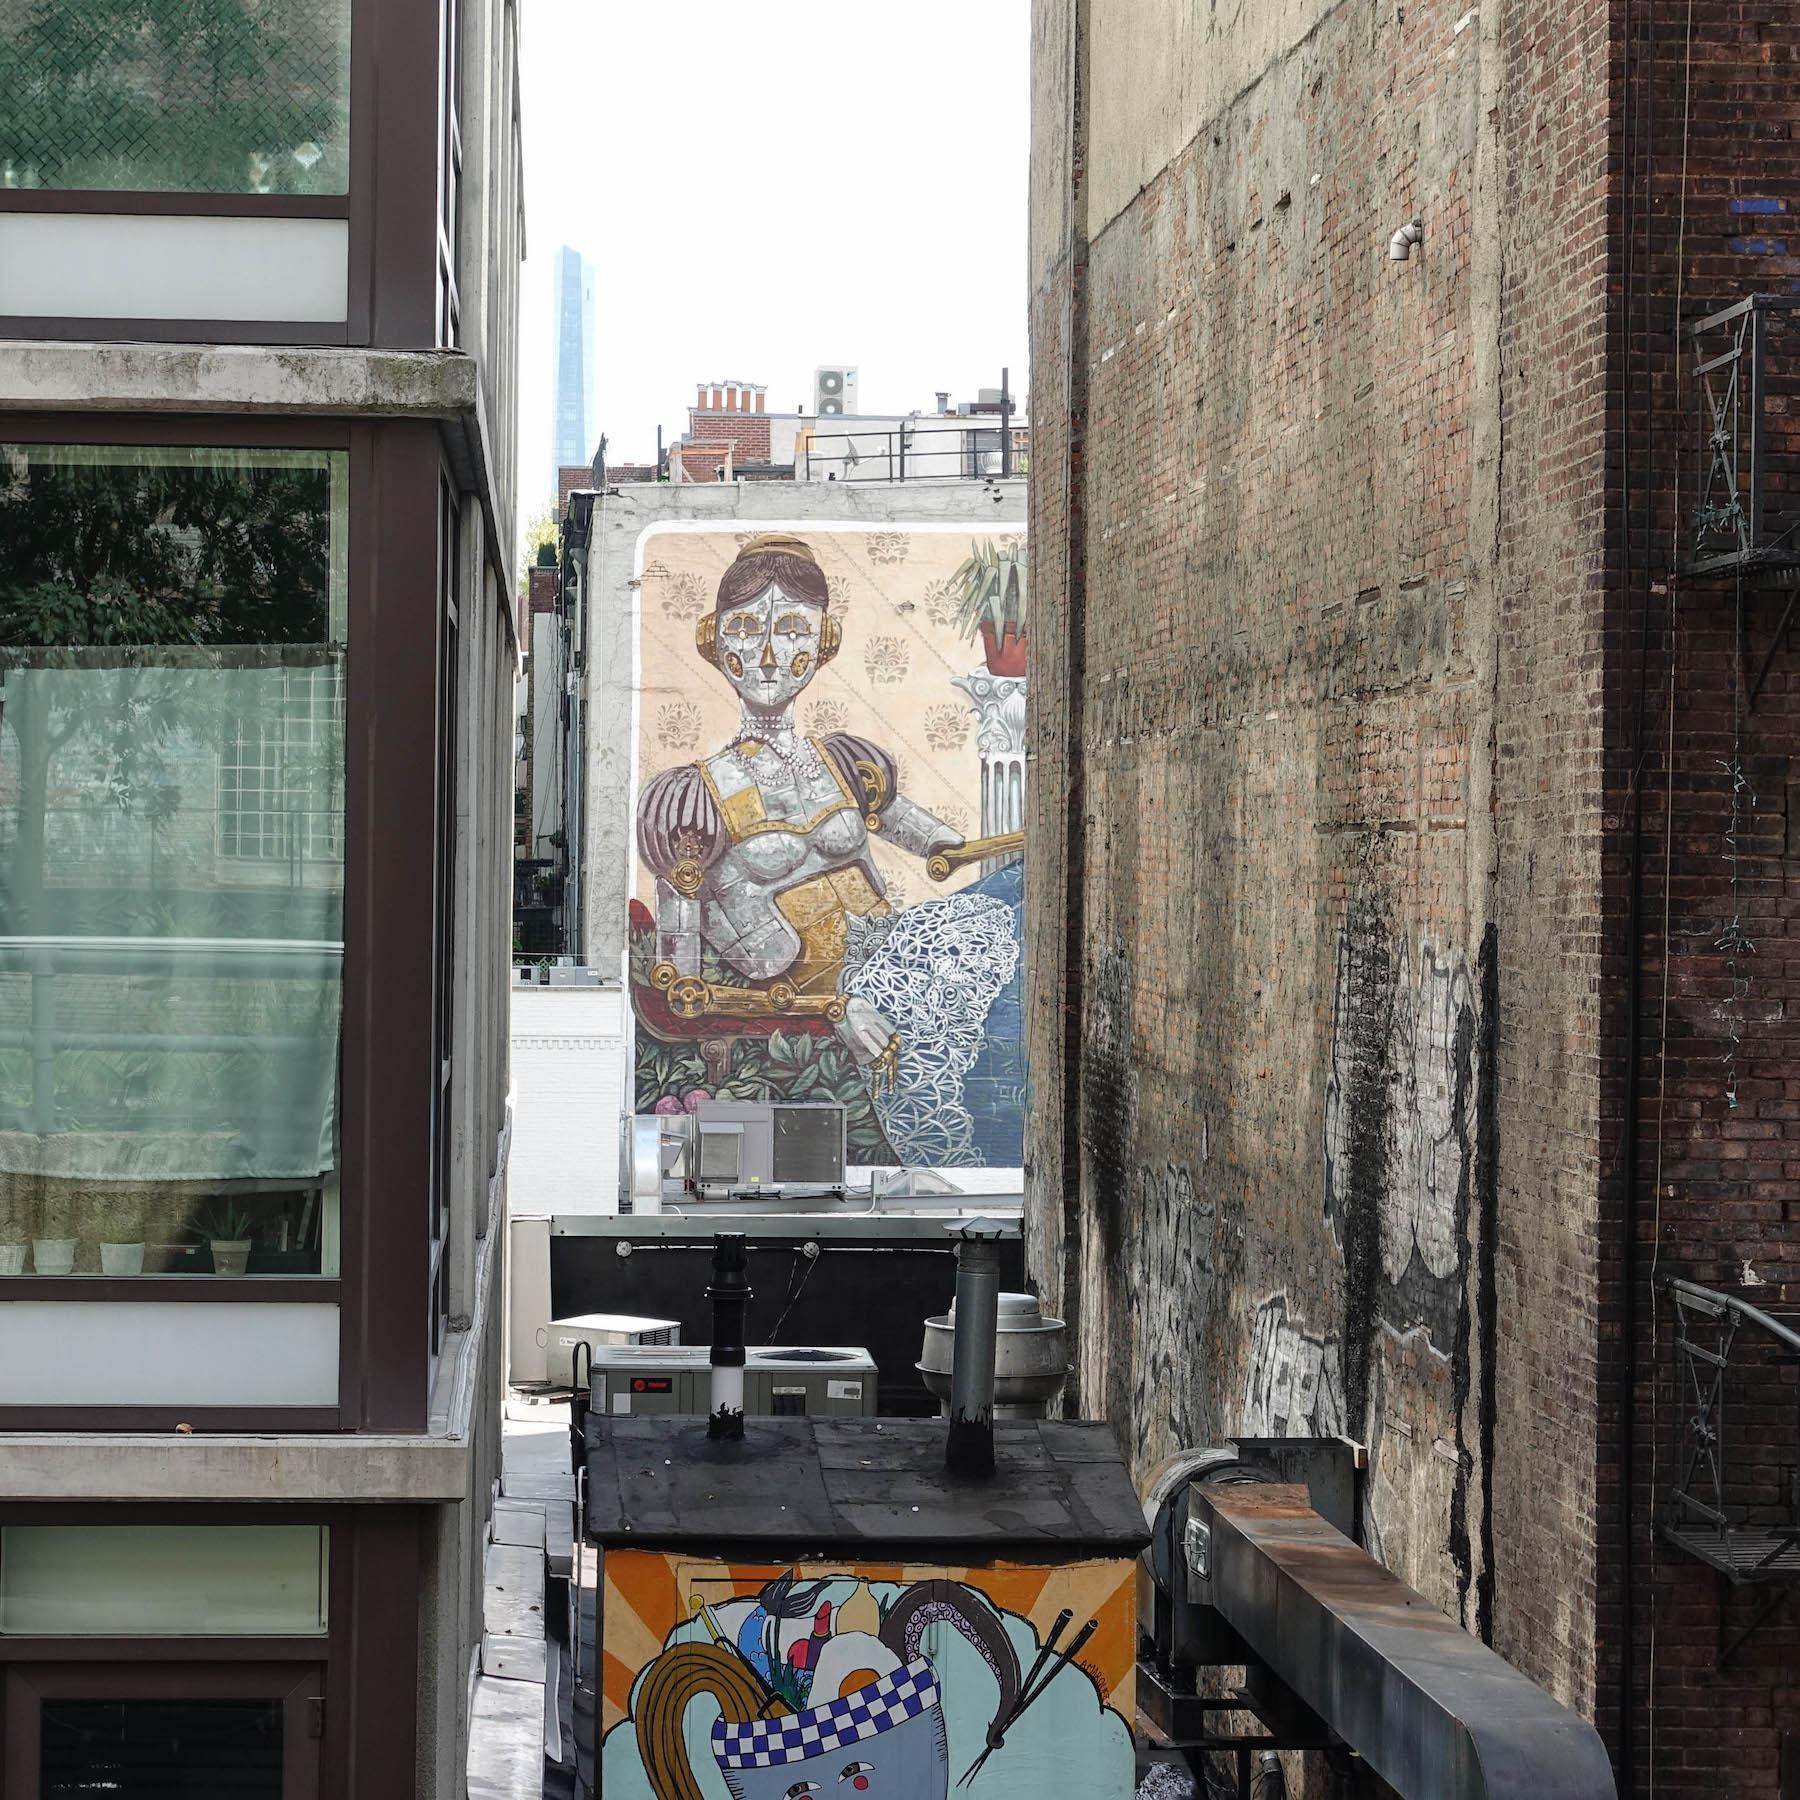 Modern Love Amazon Prime Serie suelovesnyc_modern_love_Amazon_prime_Serie_new_york_Streetart